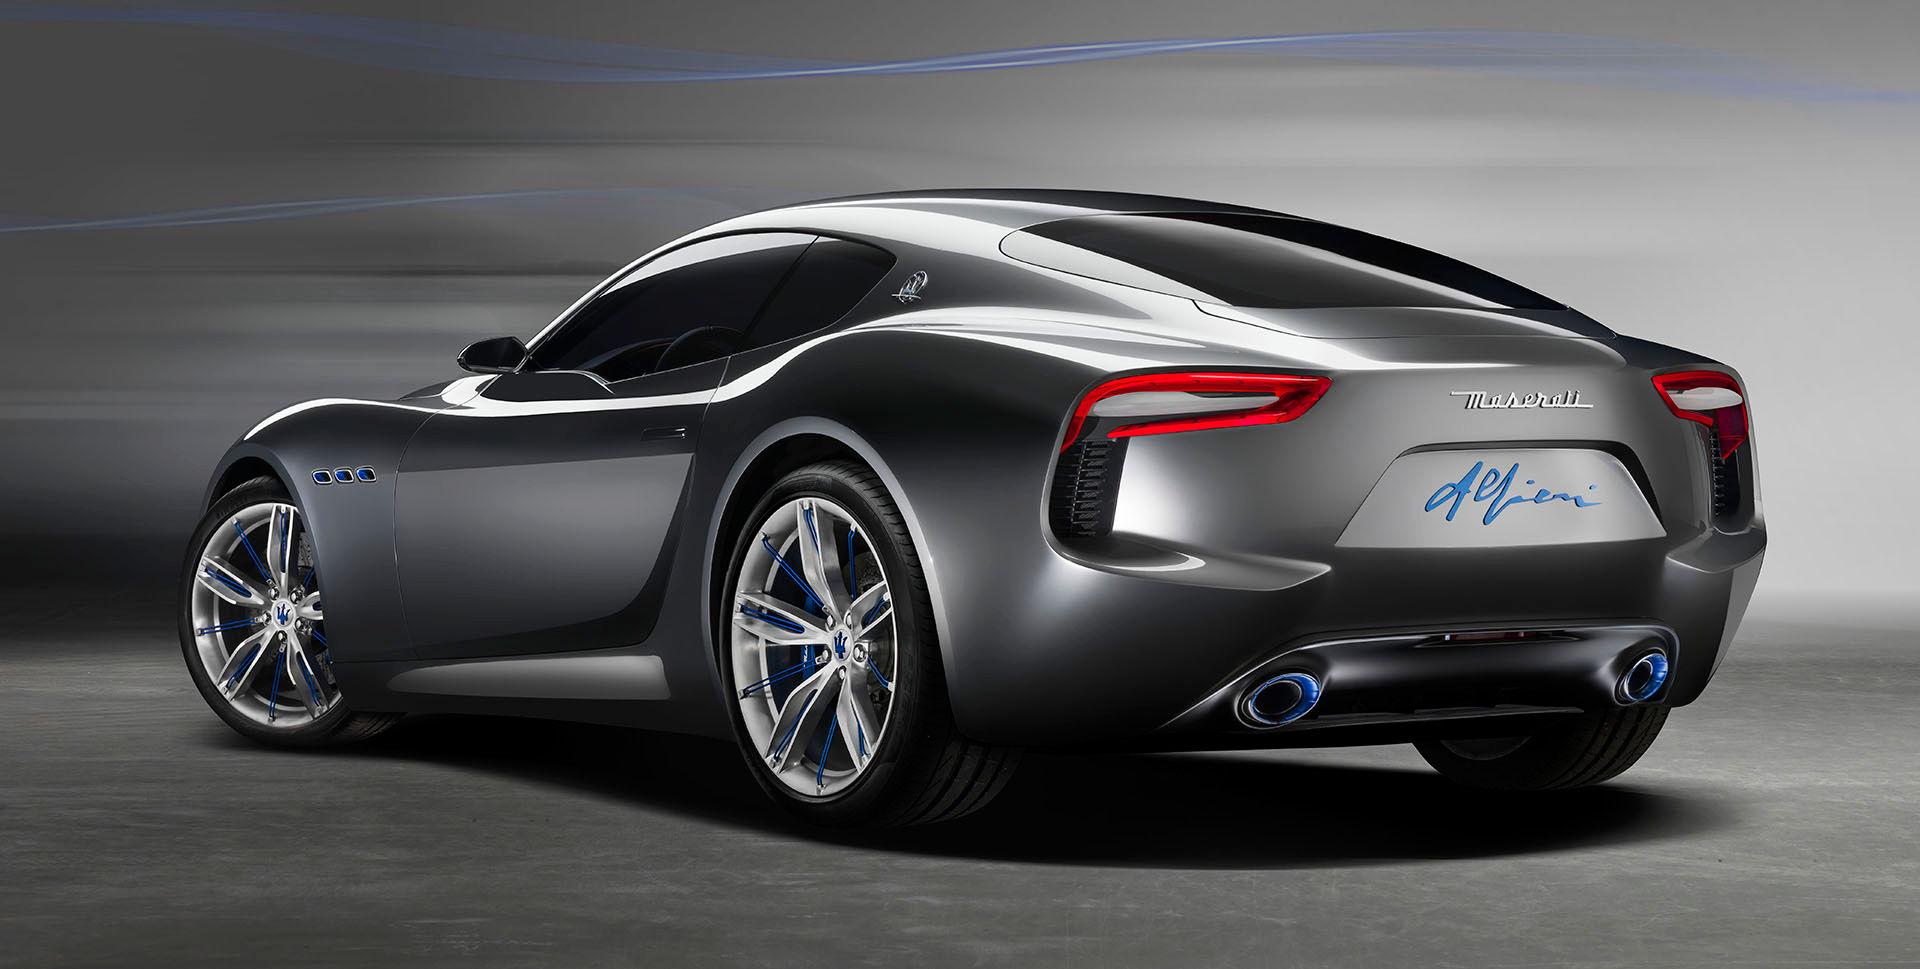 Maserati Alfieri Concept Car - Maserati's Geschichte